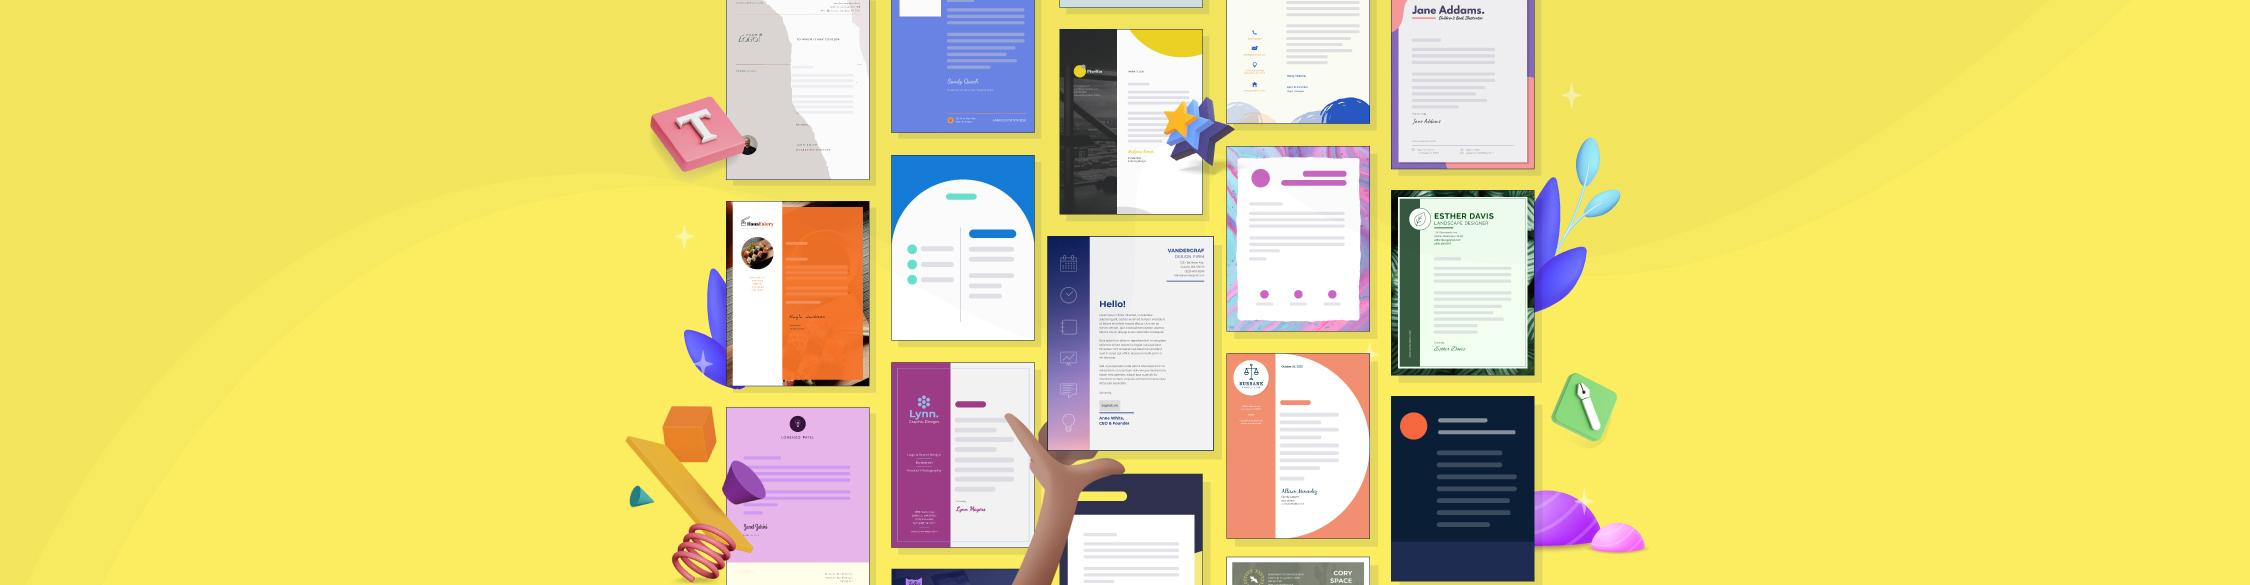 35 Business Letterhead Templates for Your Next Letter